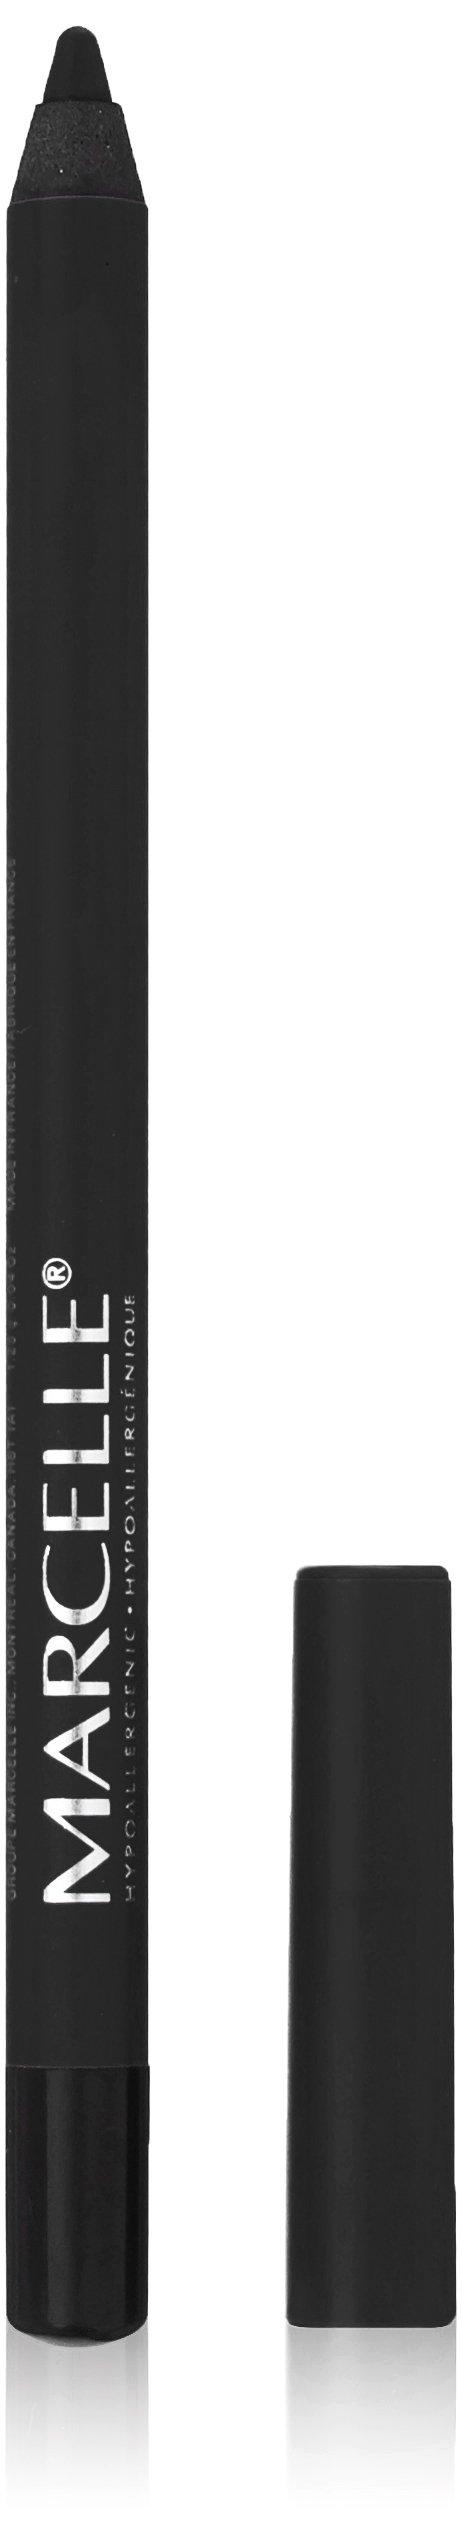 Marcelle Velvet Gel Waterproof Eyeliner, Jet Black, Hypoallergenic and Fragrance-Free, 0.04 oz